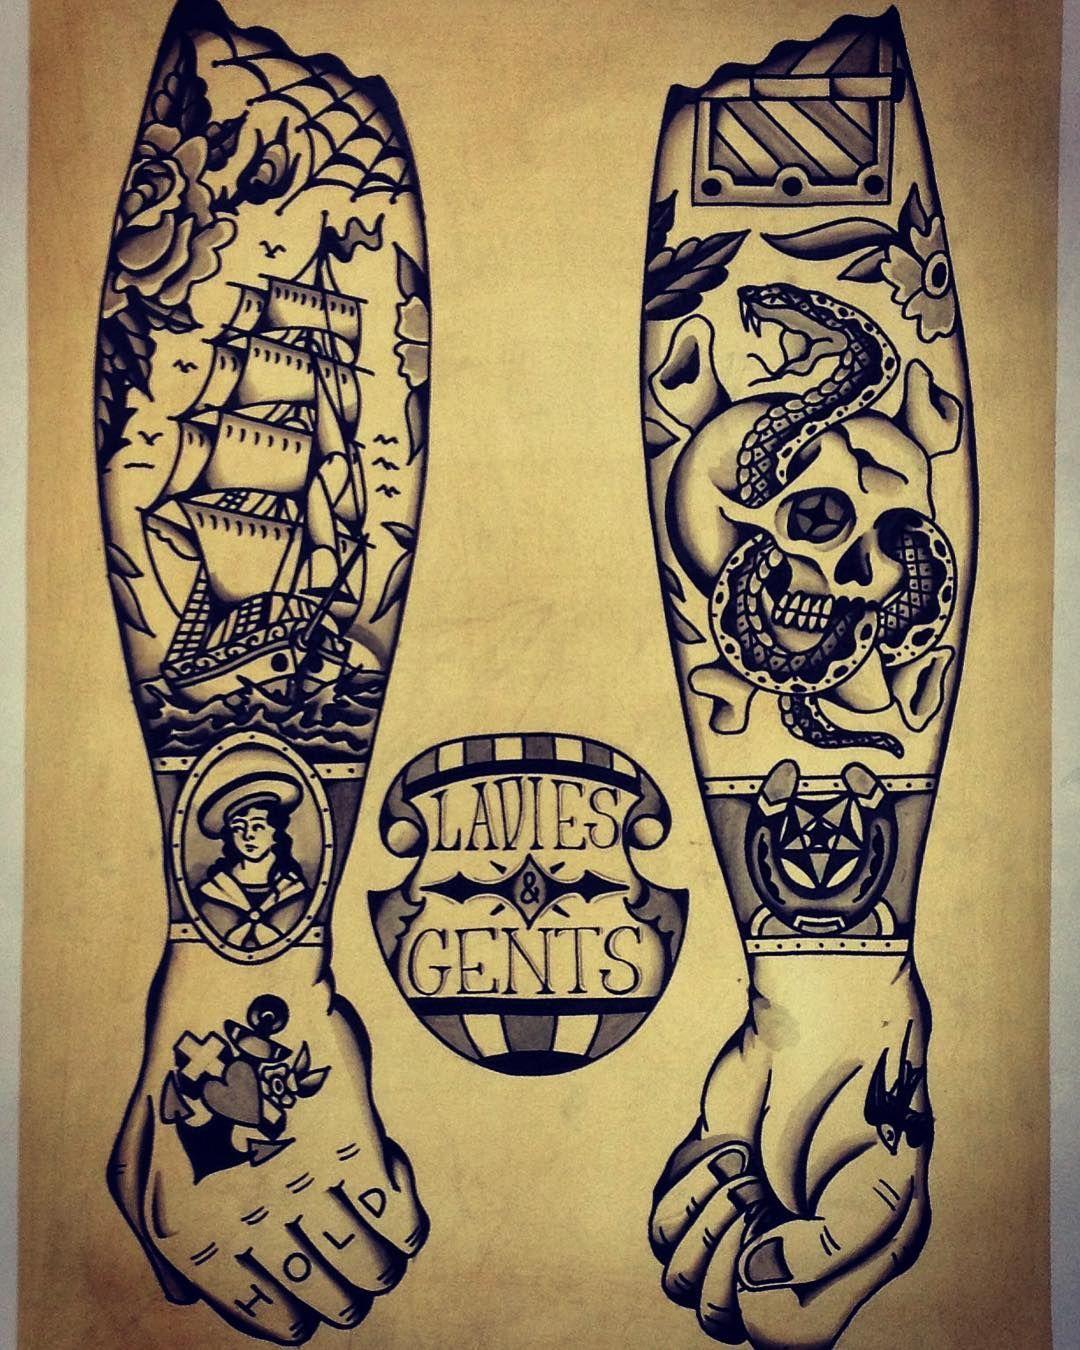 traditional tattoo design tattoos pinterest traditional tattoo design traditional tattoo. Black Bedroom Furniture Sets. Home Design Ideas